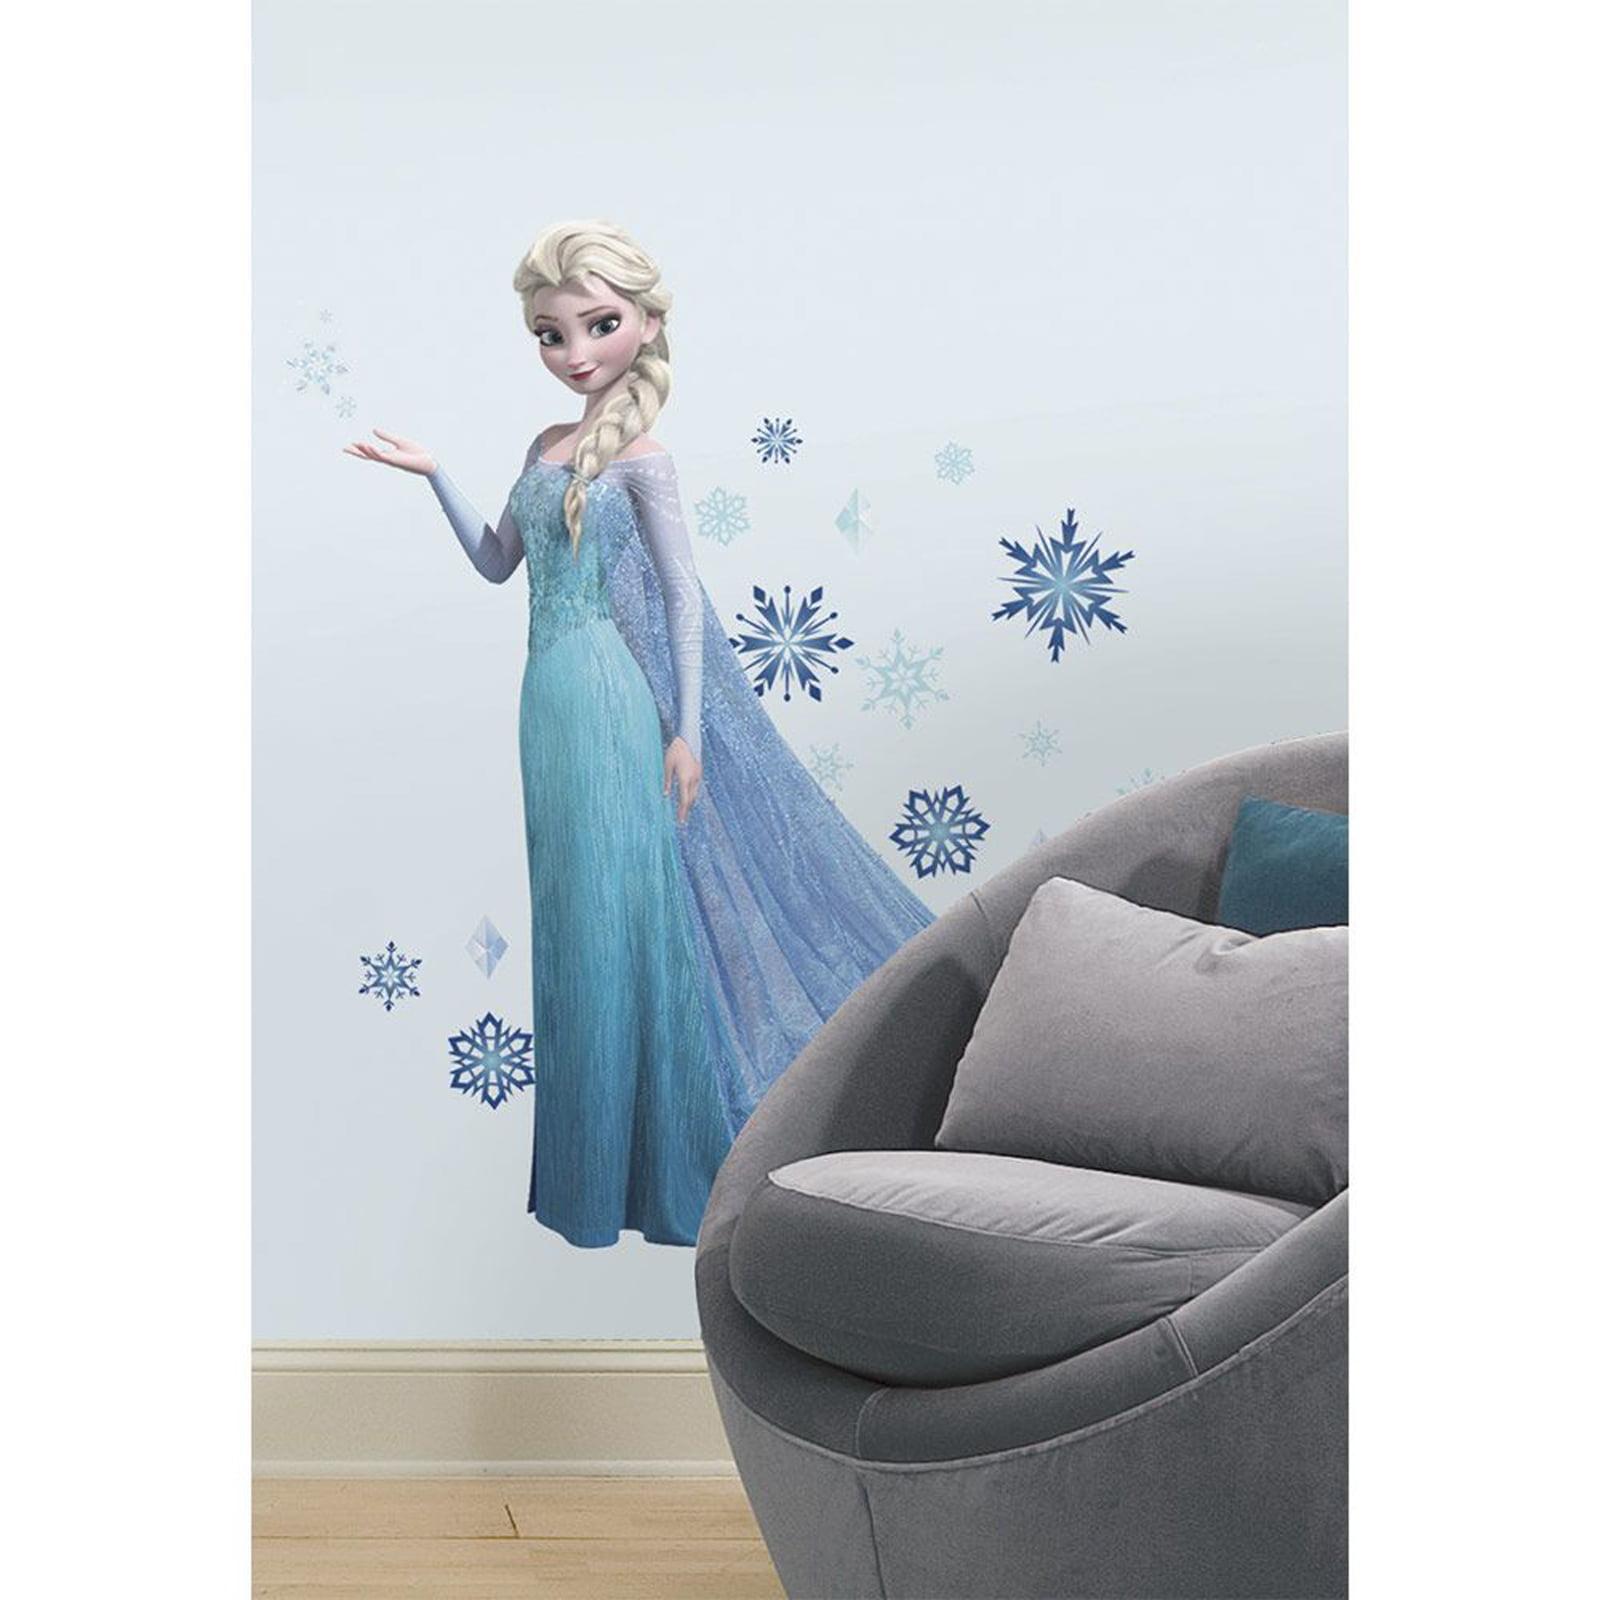 Disney Frozen Elsa Giant Wall Decal by Disney